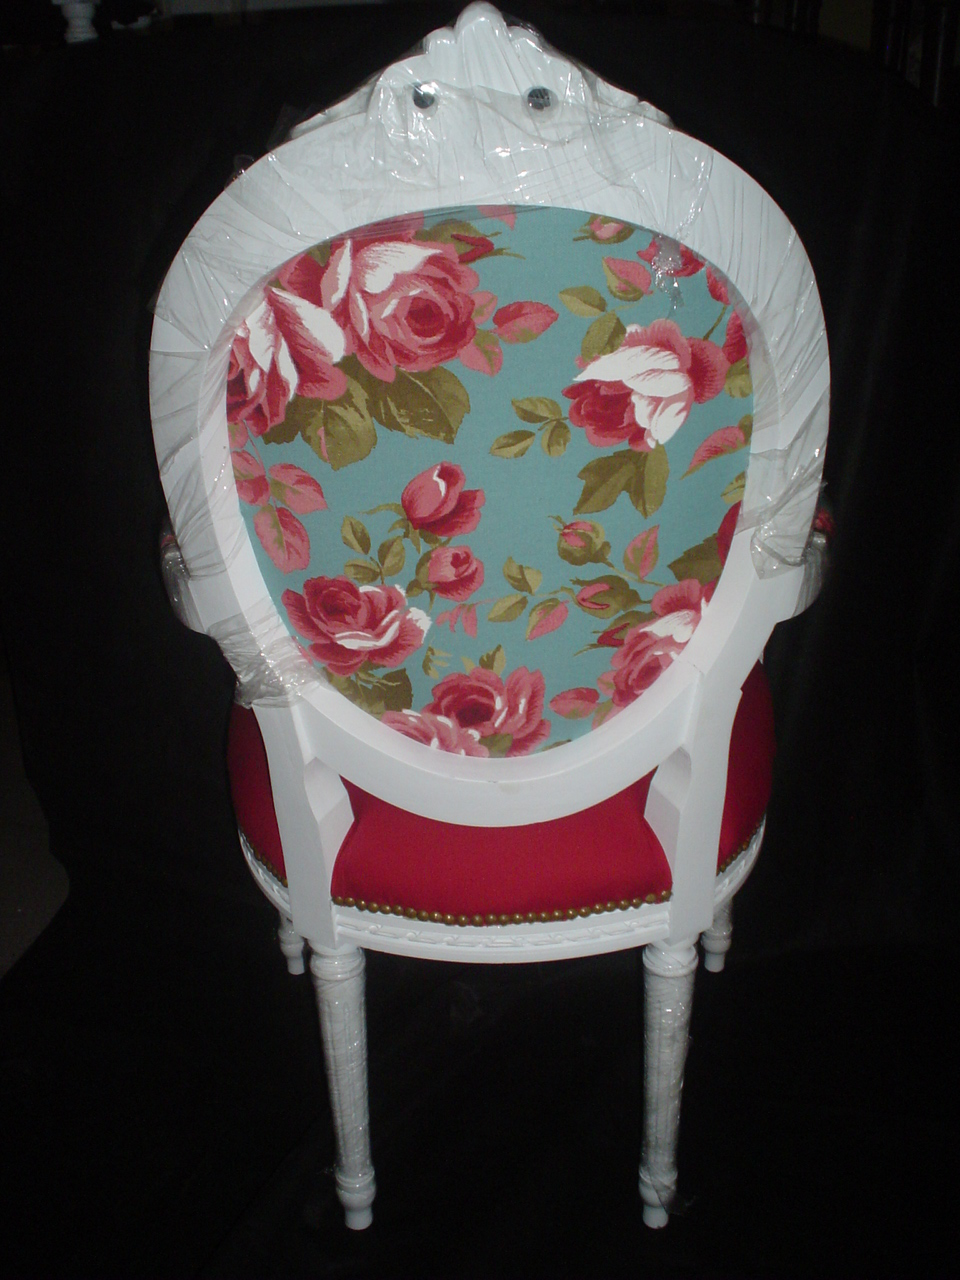 Grumsdelg interiores sillon luis xvi muy chicccccc - Sillones estilo frances ...